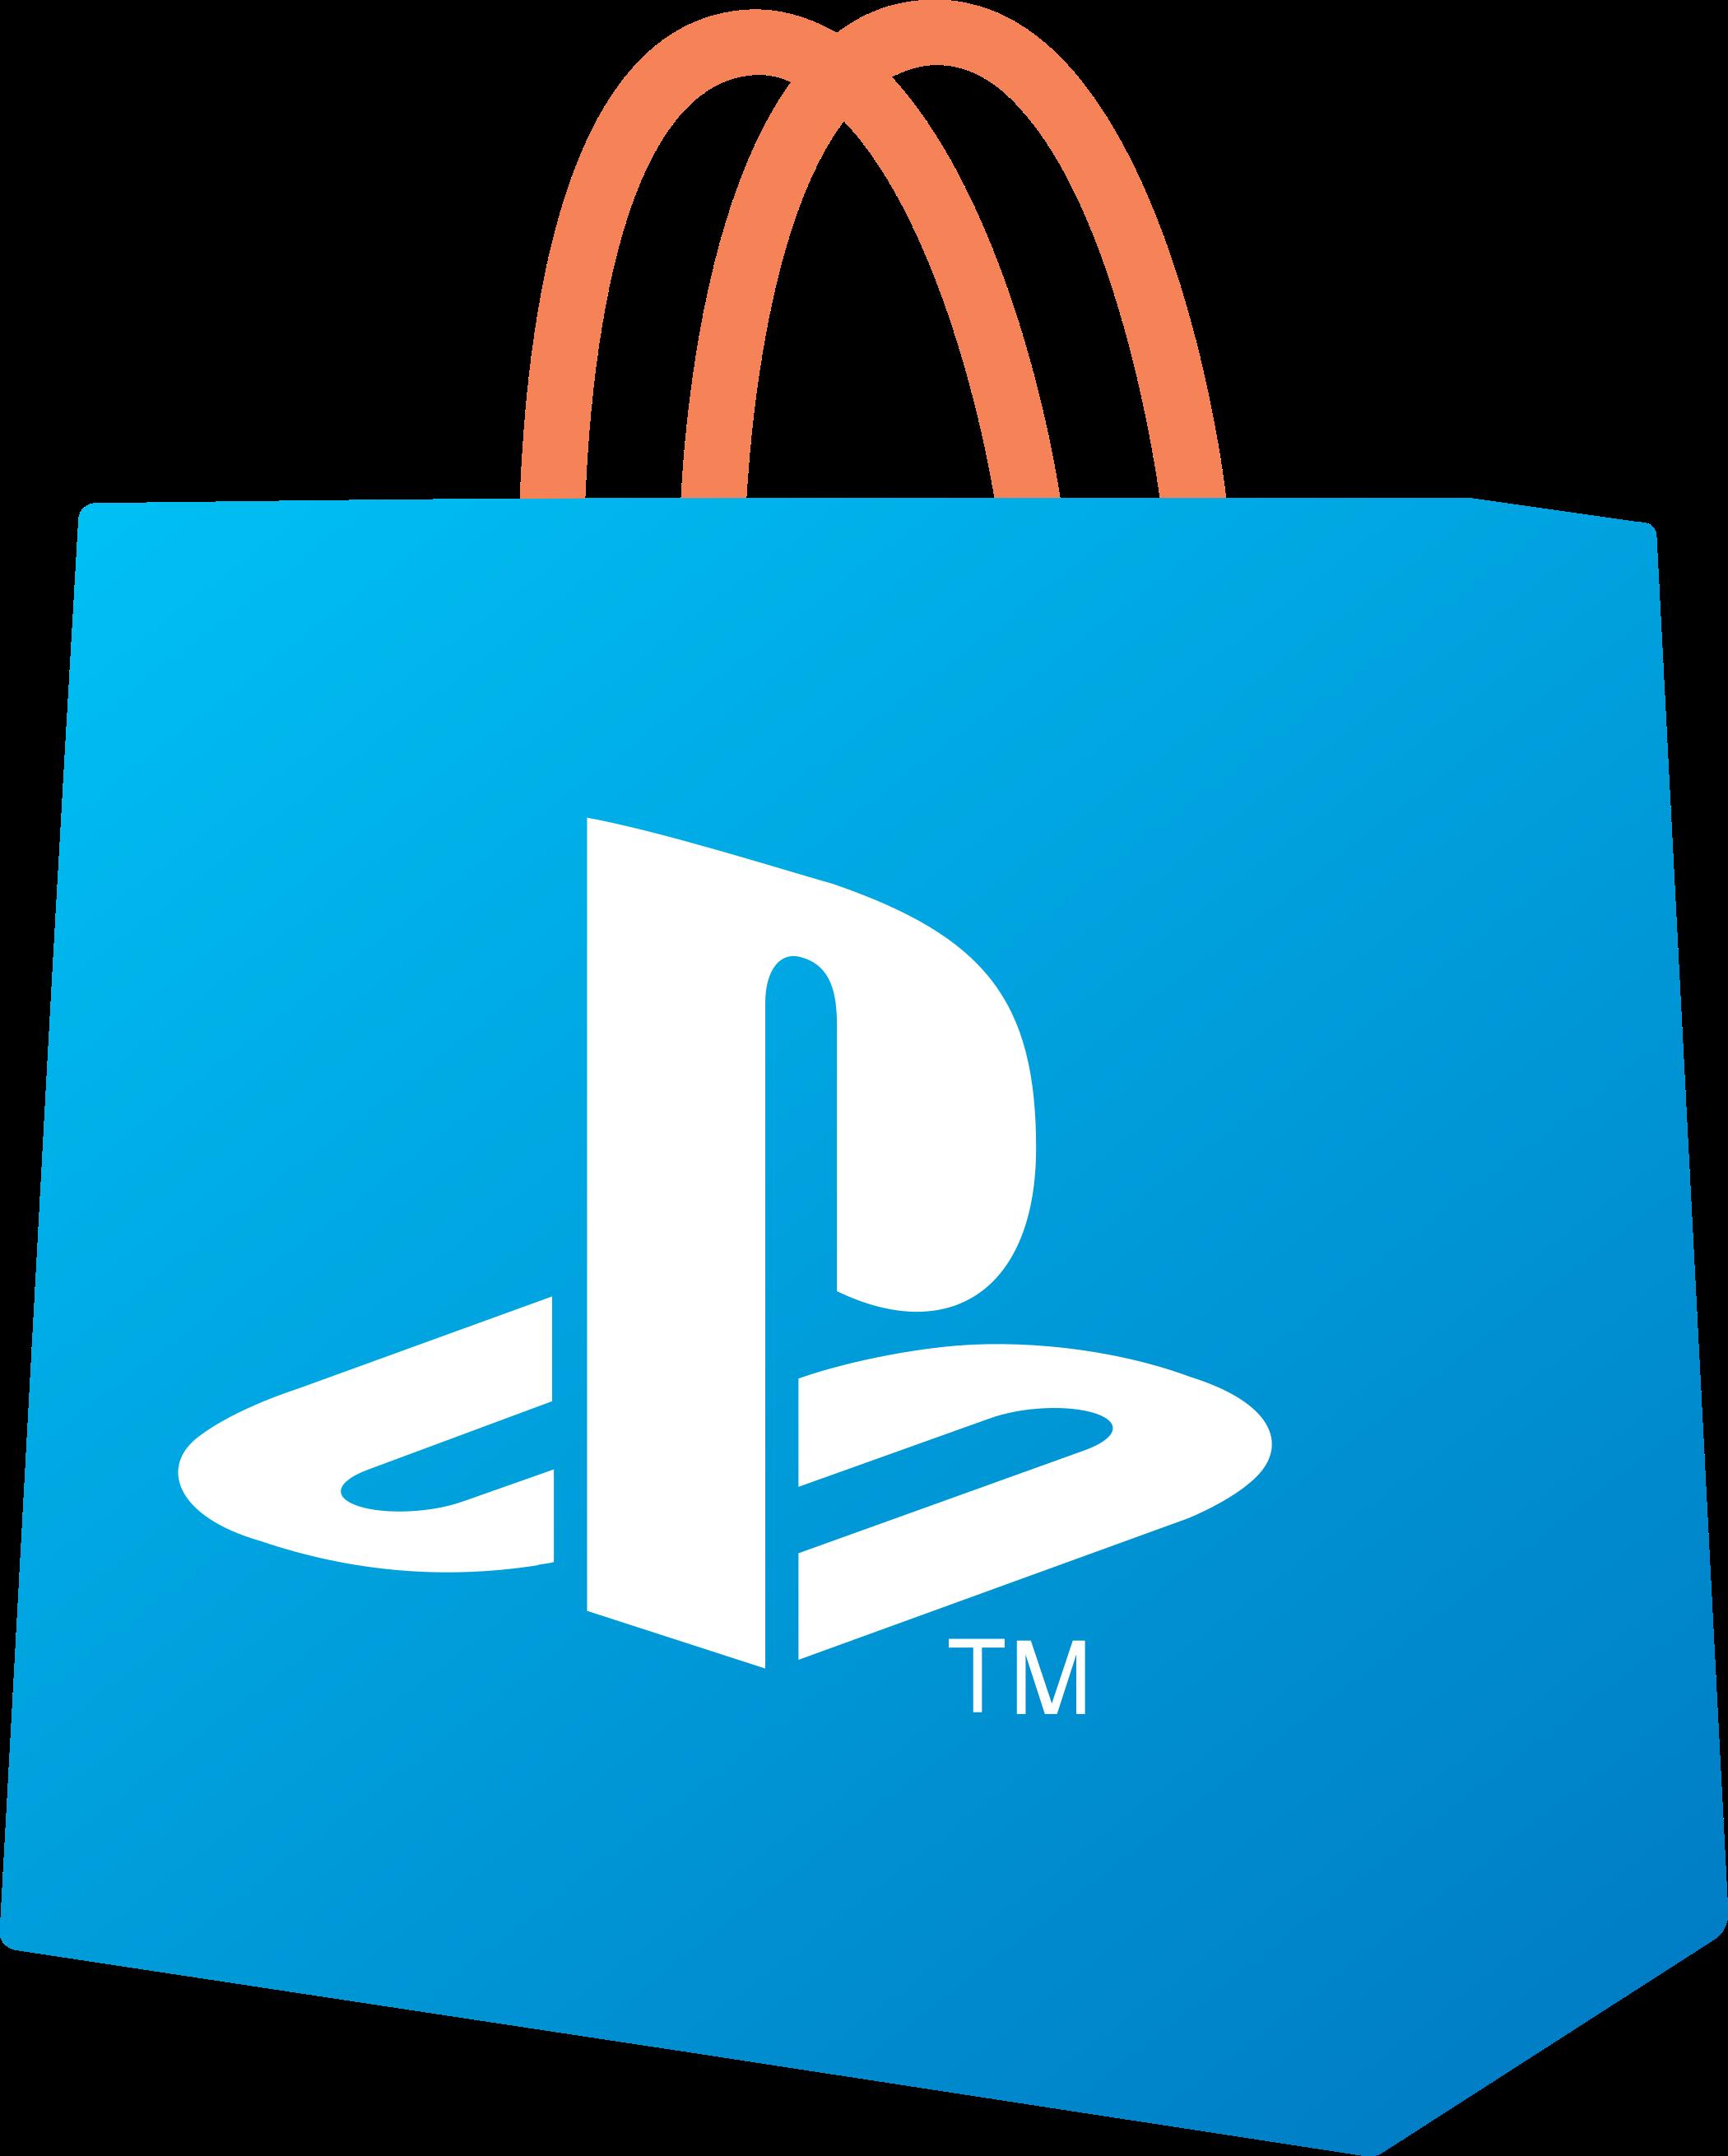 playstation store logo 3 - PlayStation Store Logo